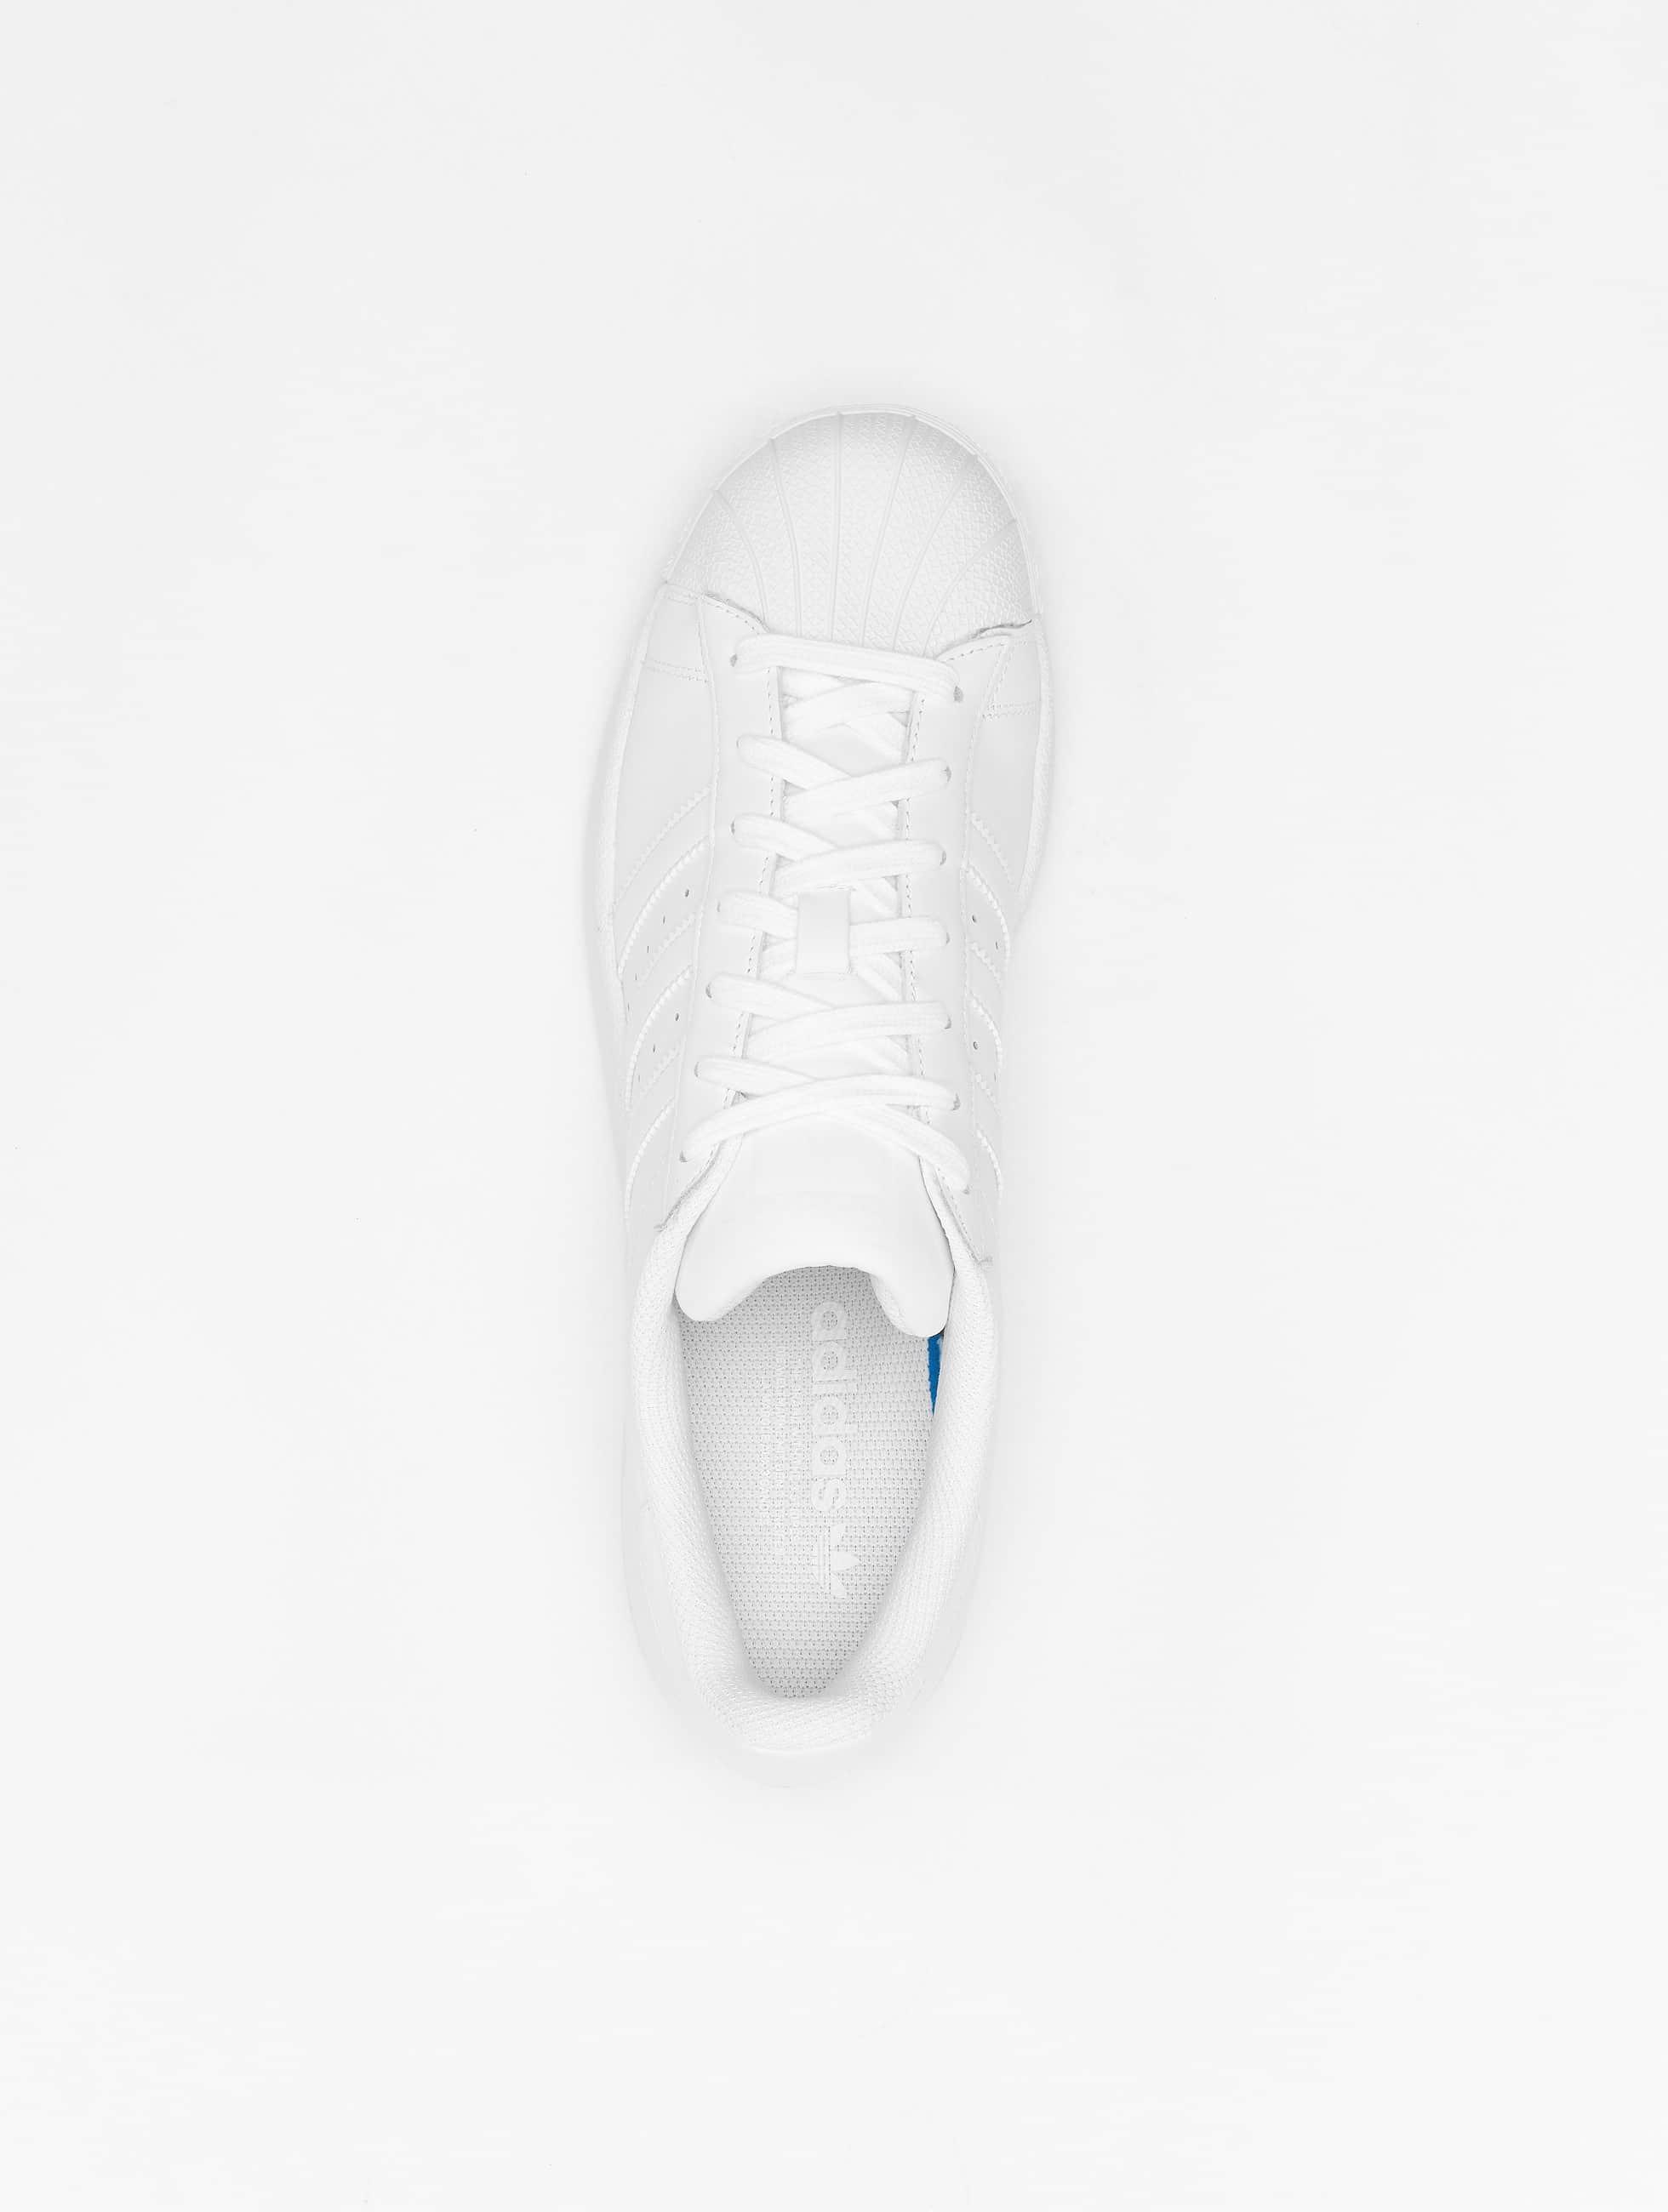 adidas originals Damen Founda Schuhe / Sneaker Superstar Founda Damen 67e630